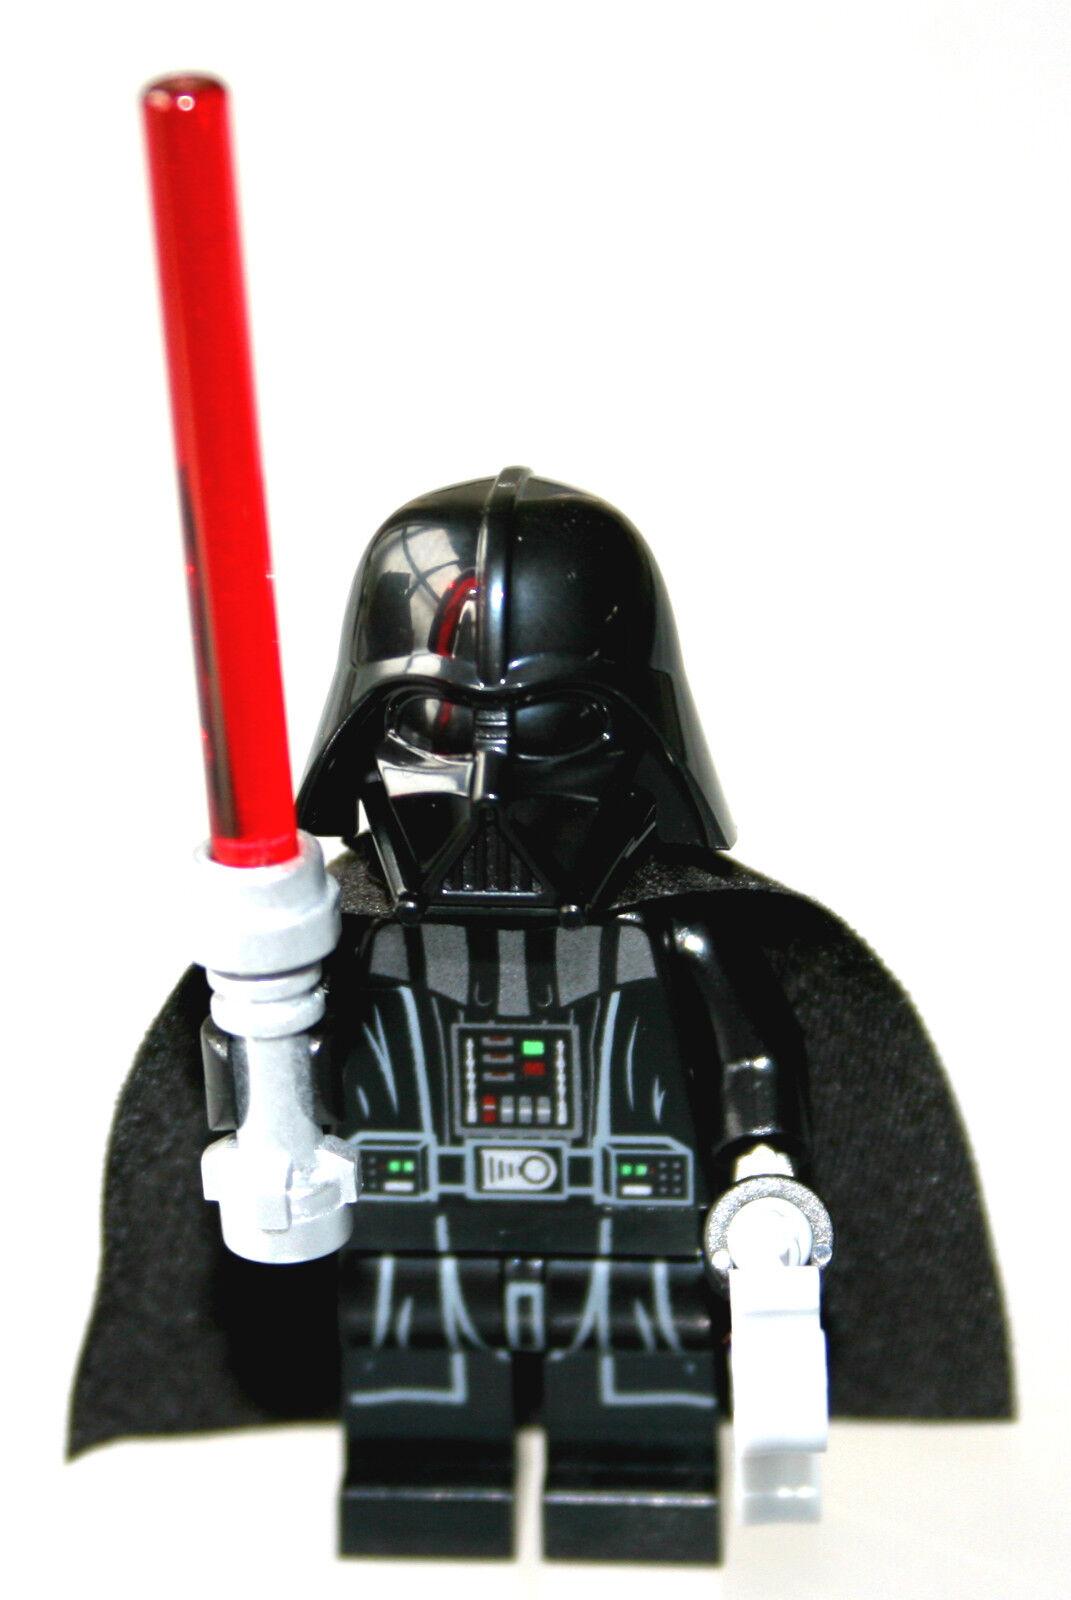 Lego 75093 Star Wars Darth Vader Minifigure Type 2 Helmet & Light Saber 2015 New